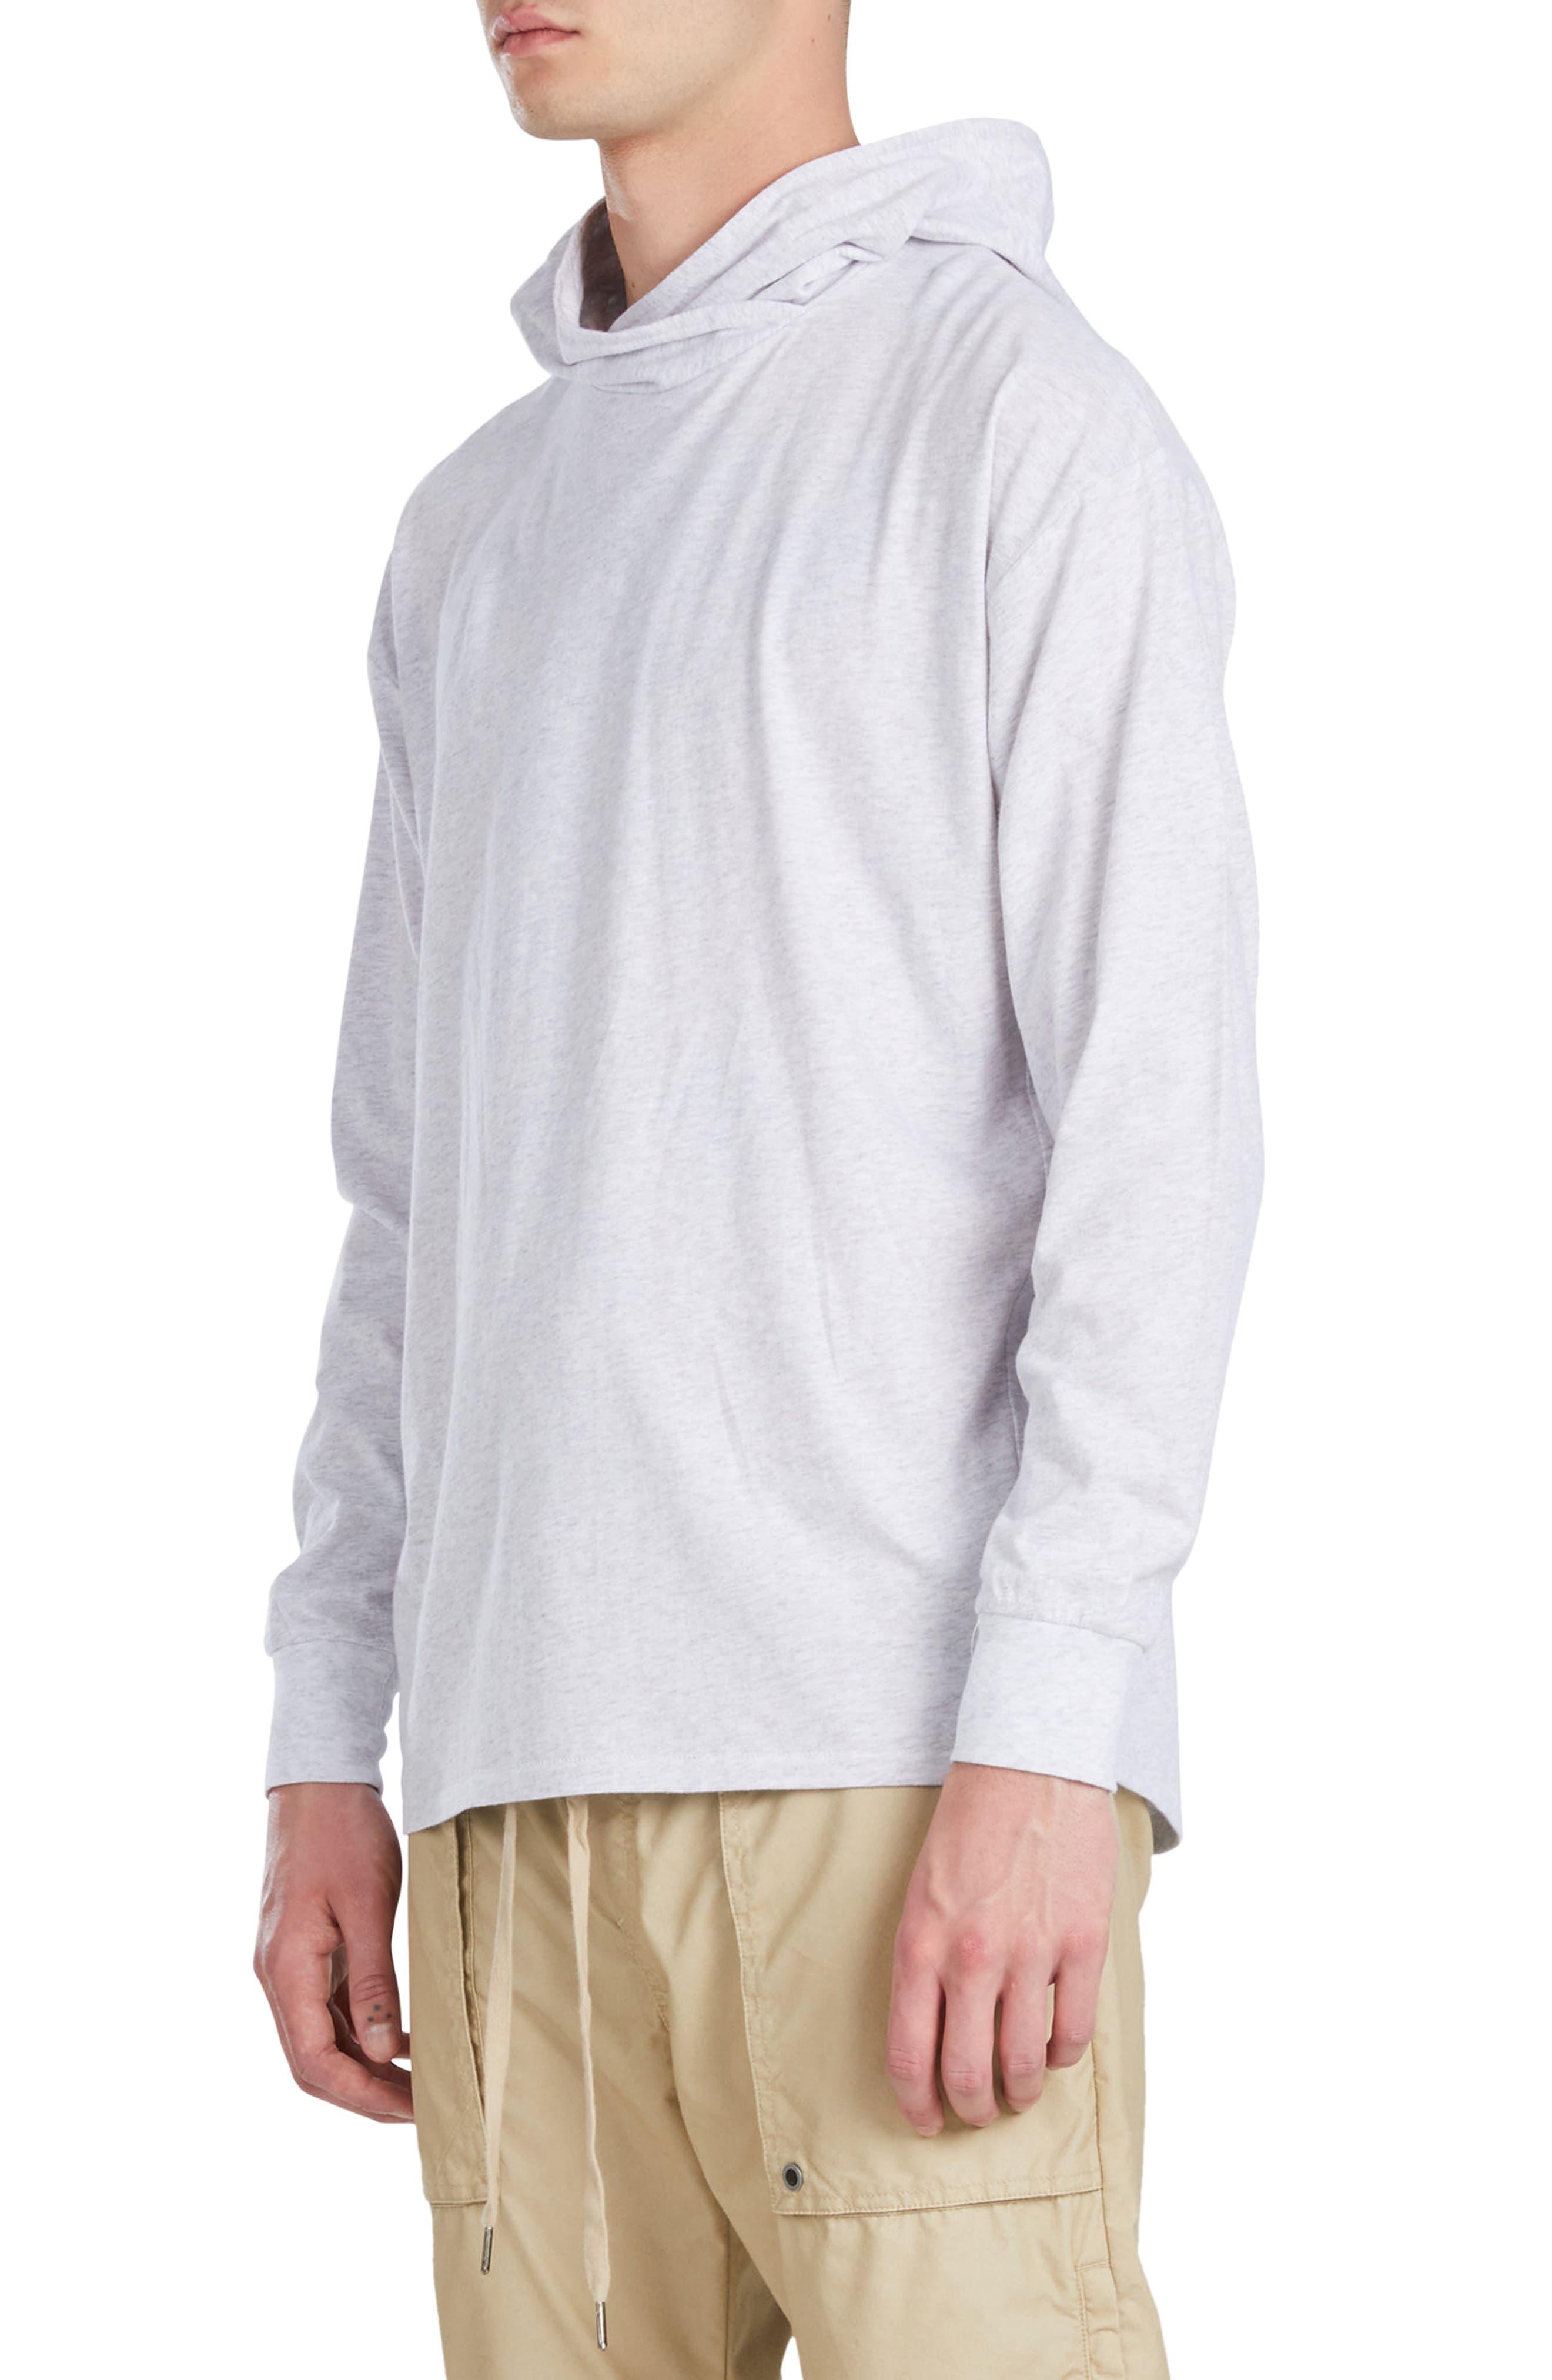 Rugger Long Sleeve Hooded T-Shirt,                             Alternate thumbnail 3, color,                             Bleach Marled